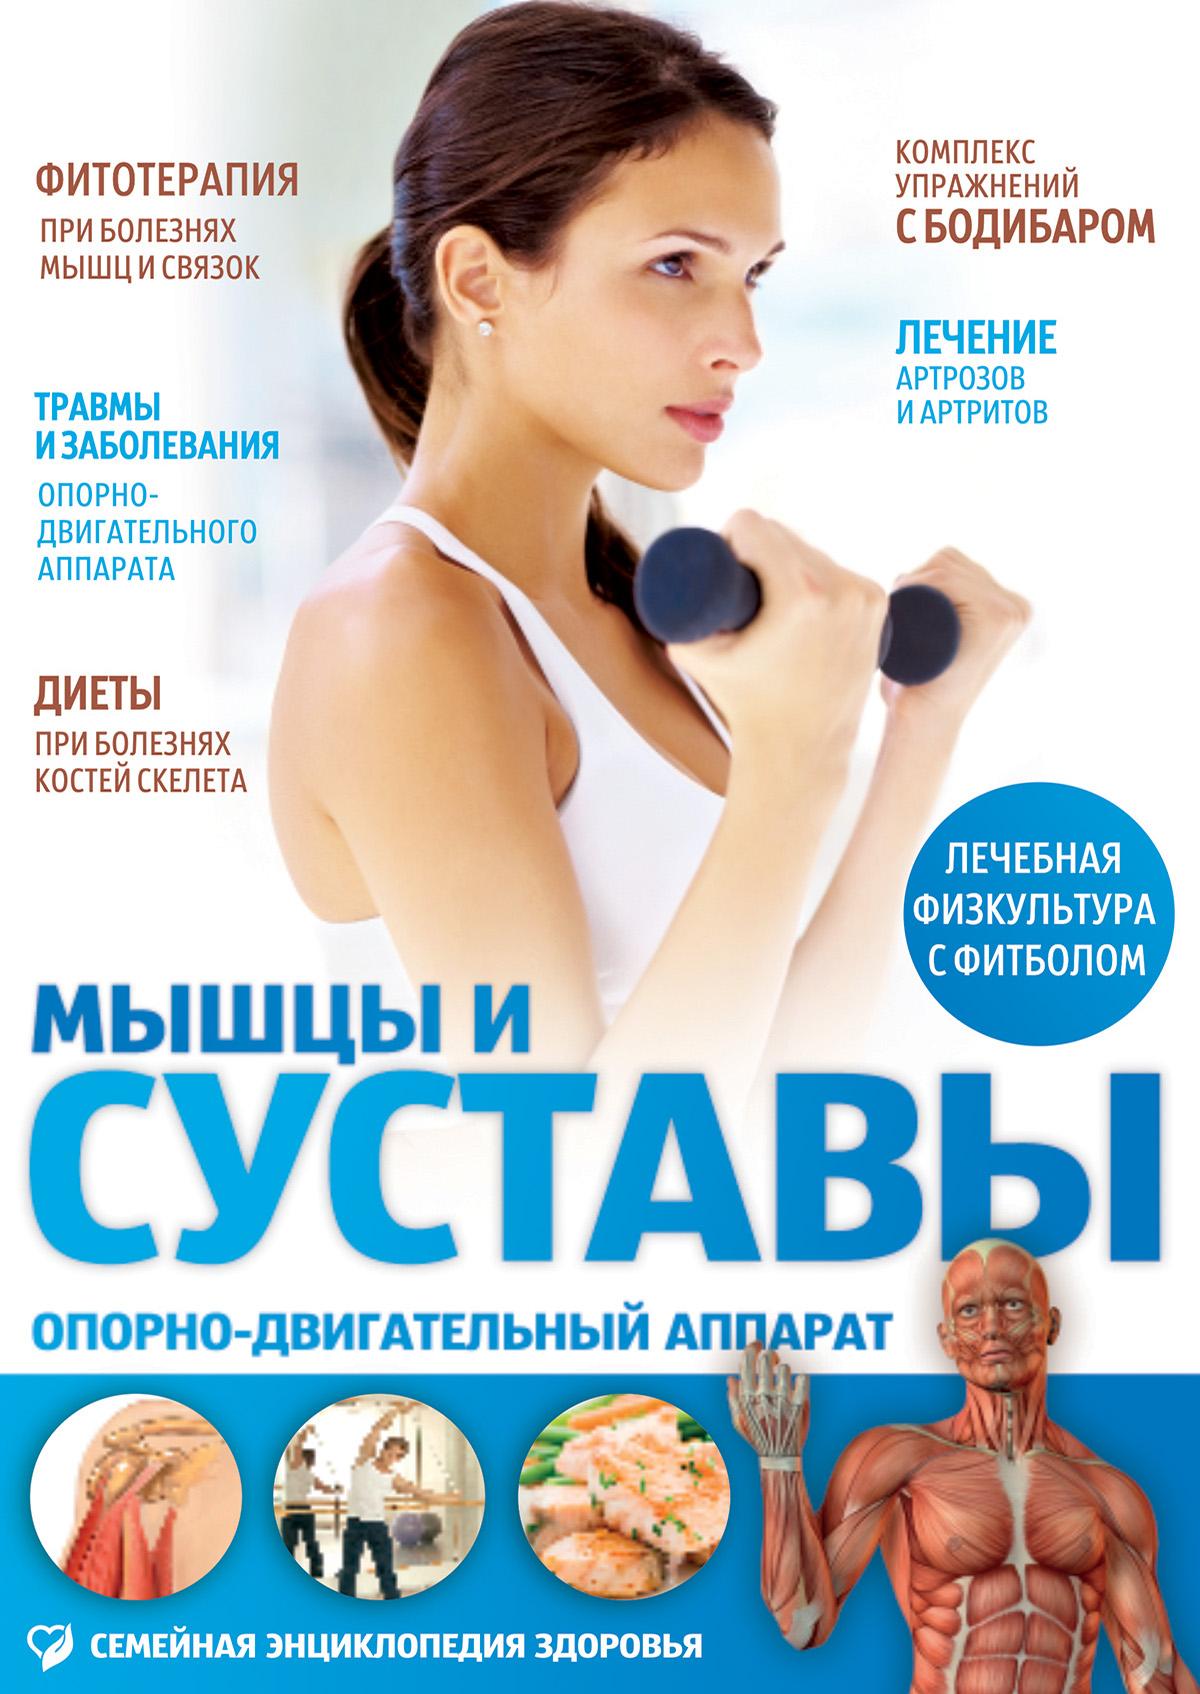 Мышцы и суставы. Опорно-двигательный аппарат